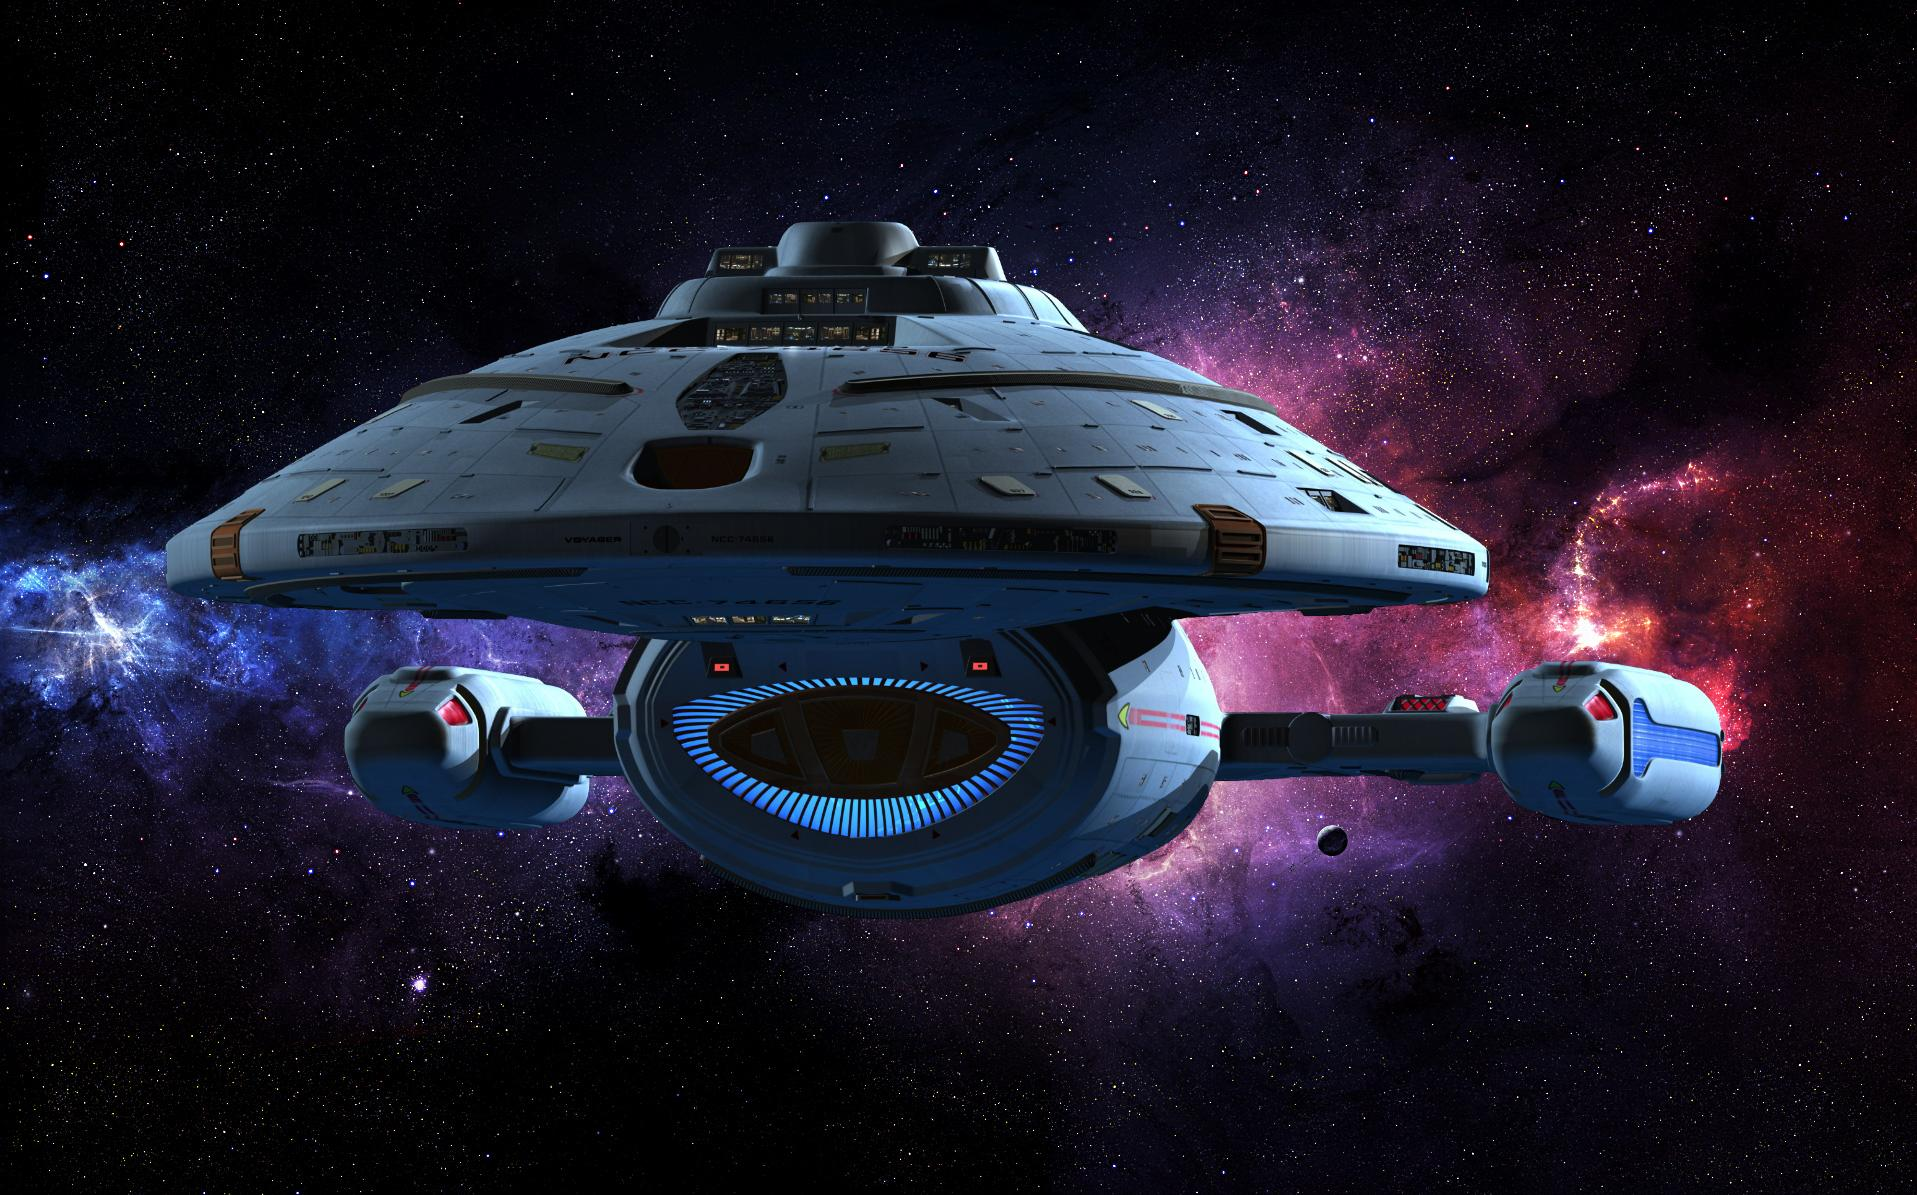 1200 Star Trek Wallpapers Star Trek Backgrounds 1917x1195